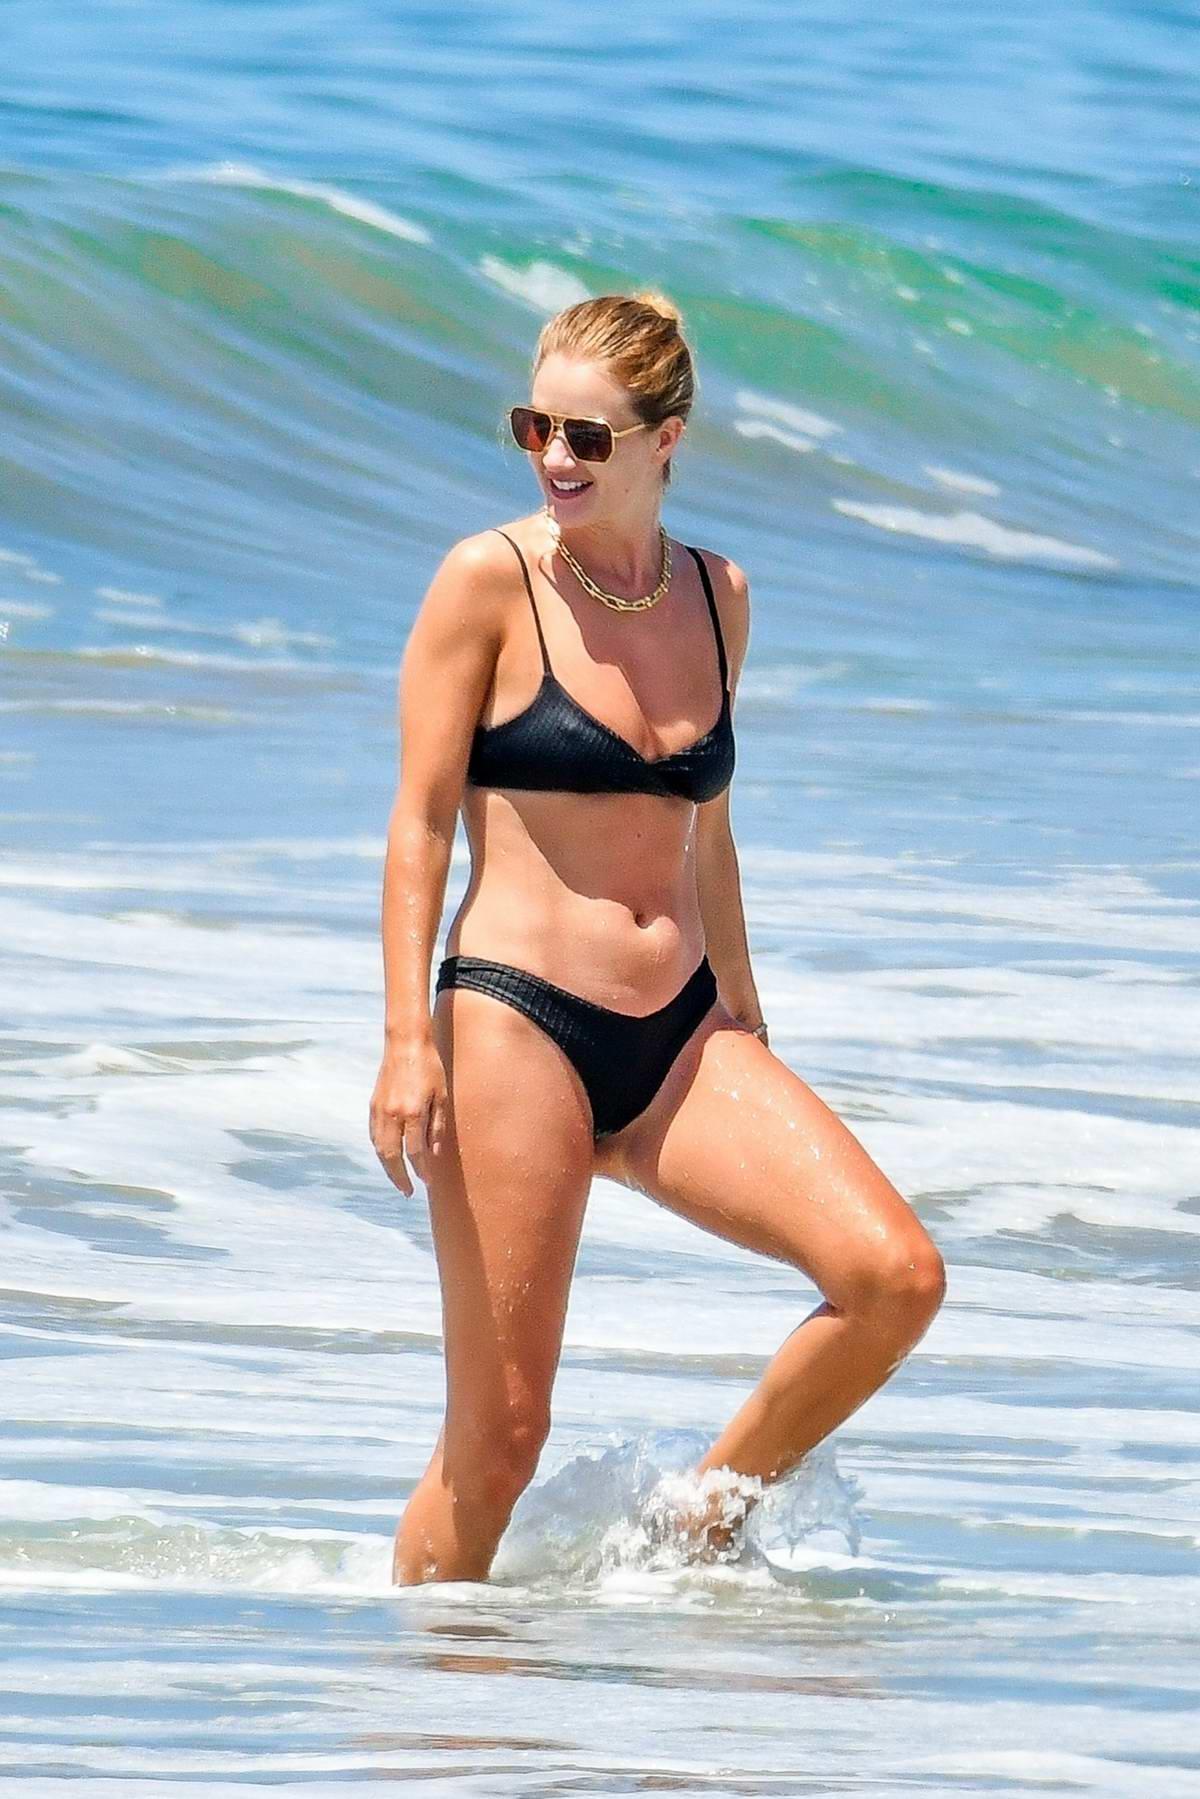 Rosie Huntington-Whiteley shows off her beach body in a black bikini as she hits the ocean in Malibu, California